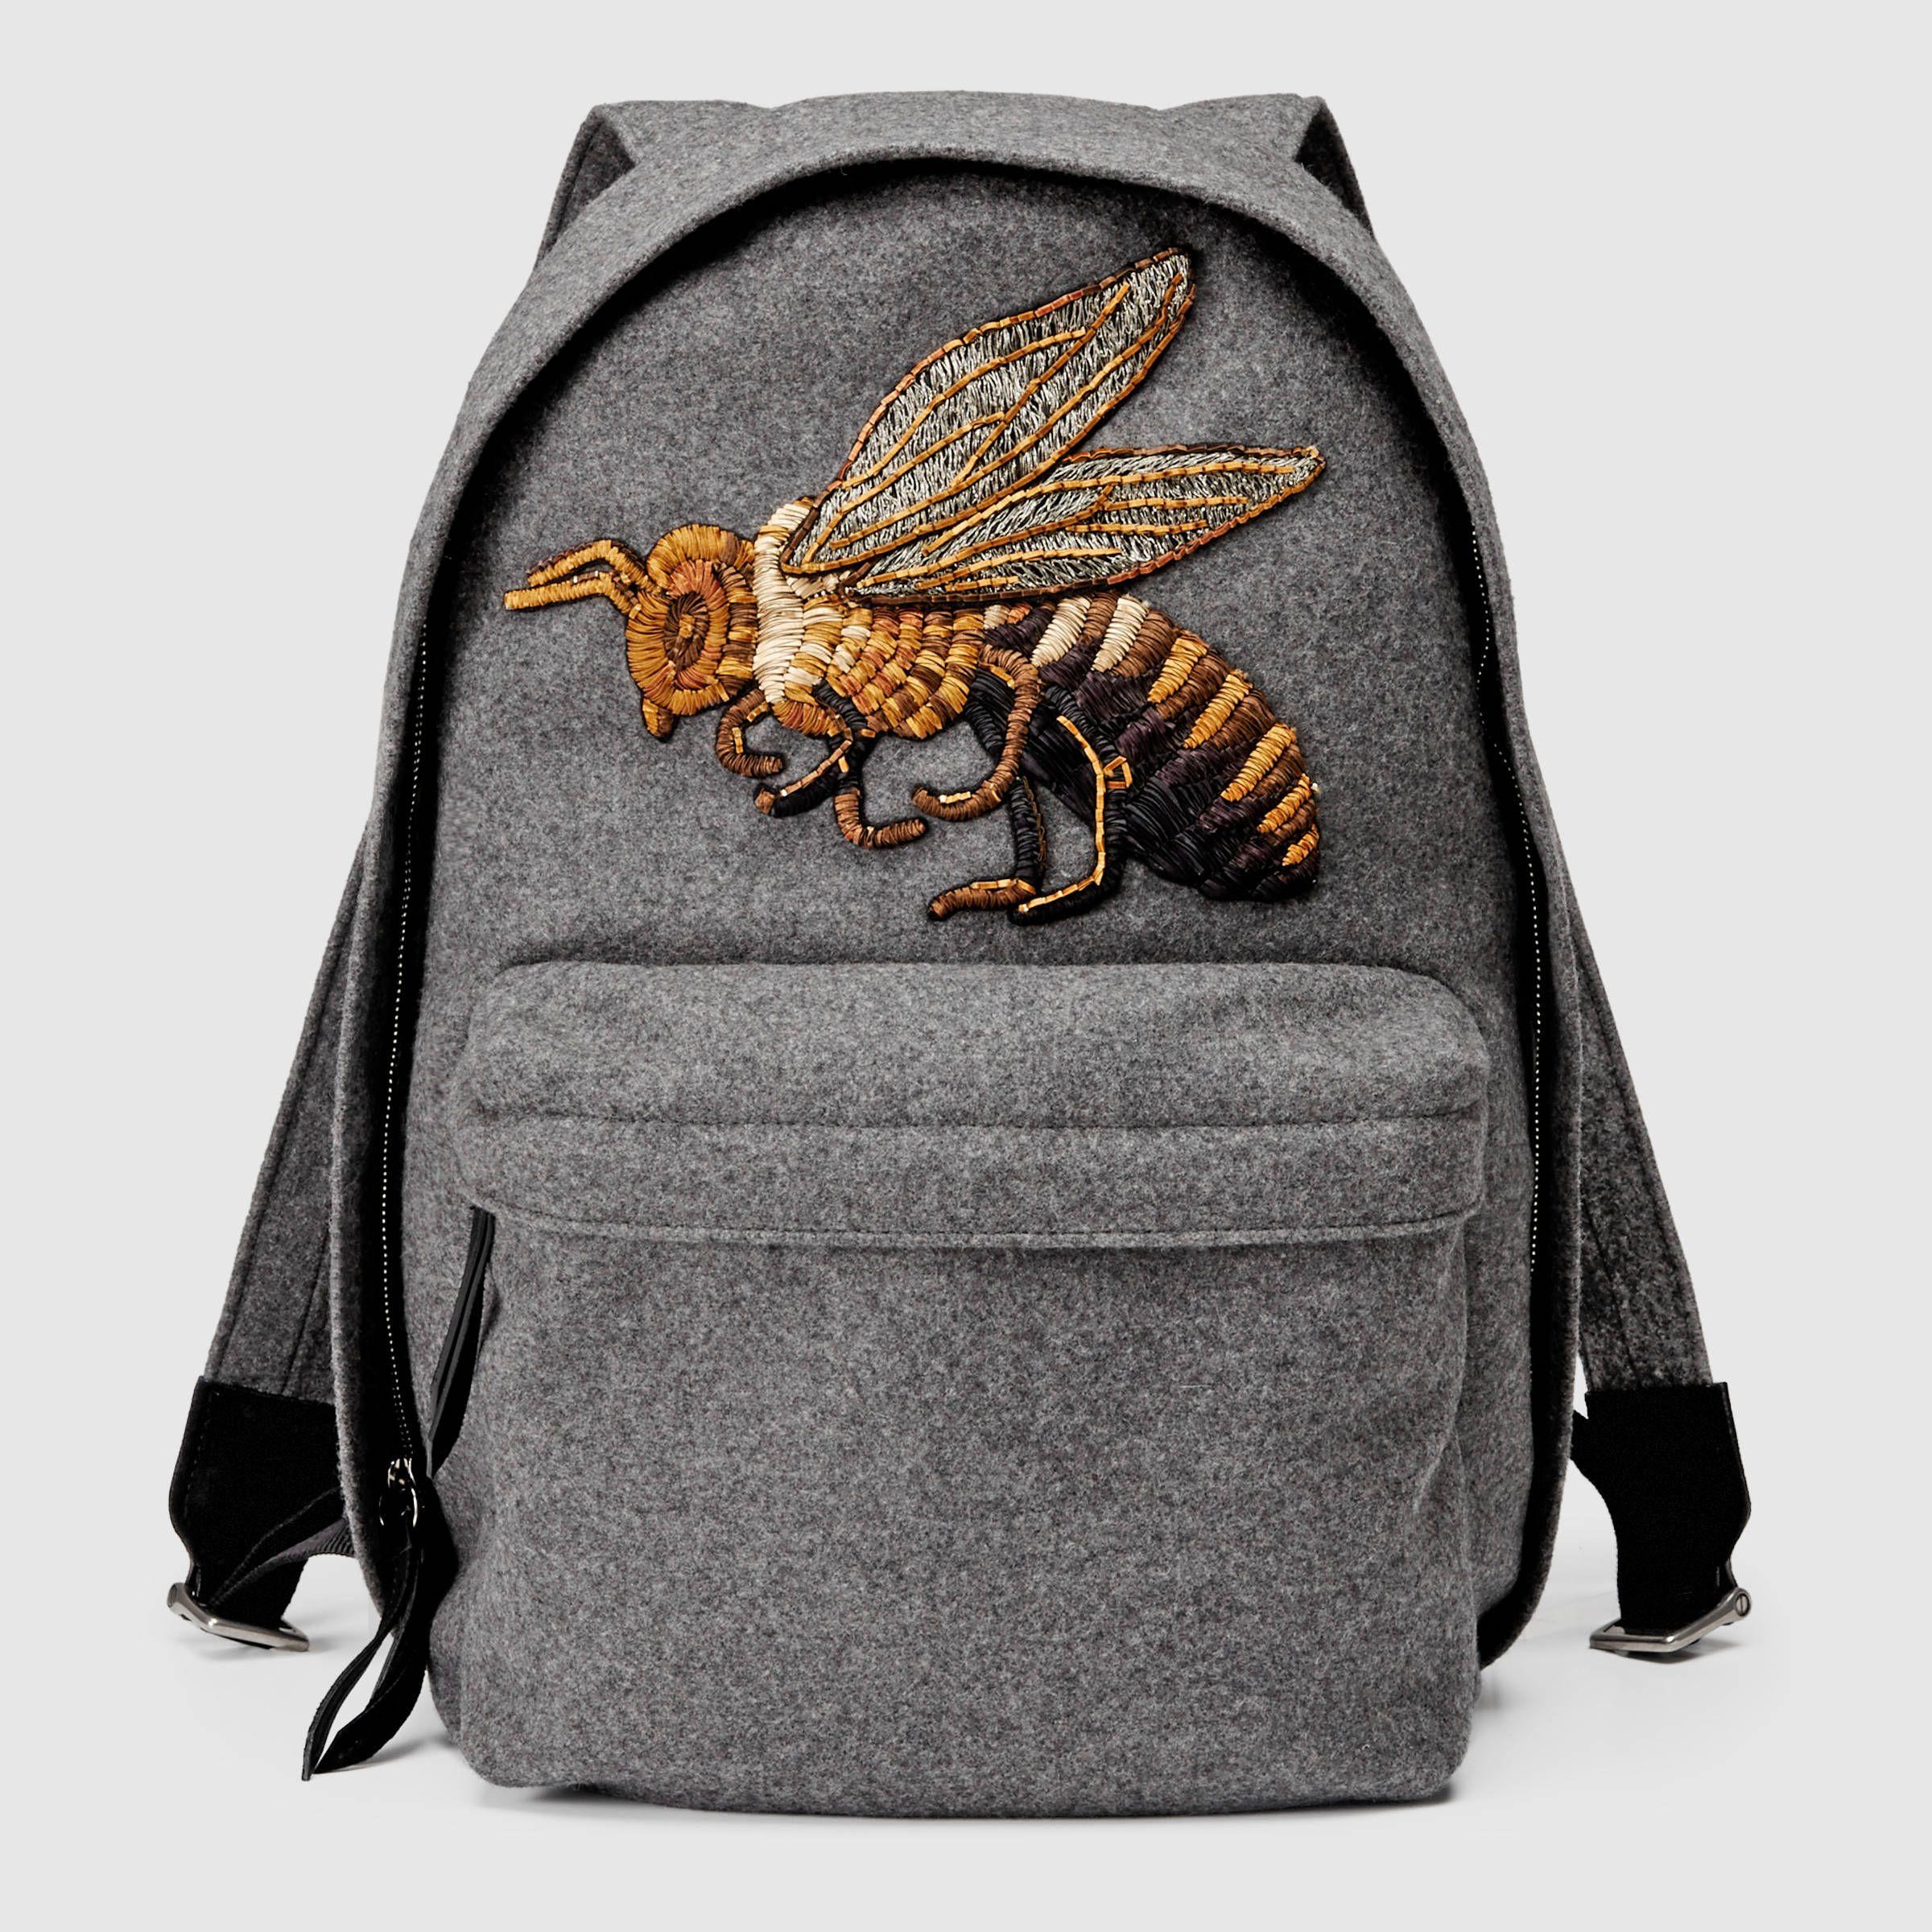 Gucci Backpack Black Bee